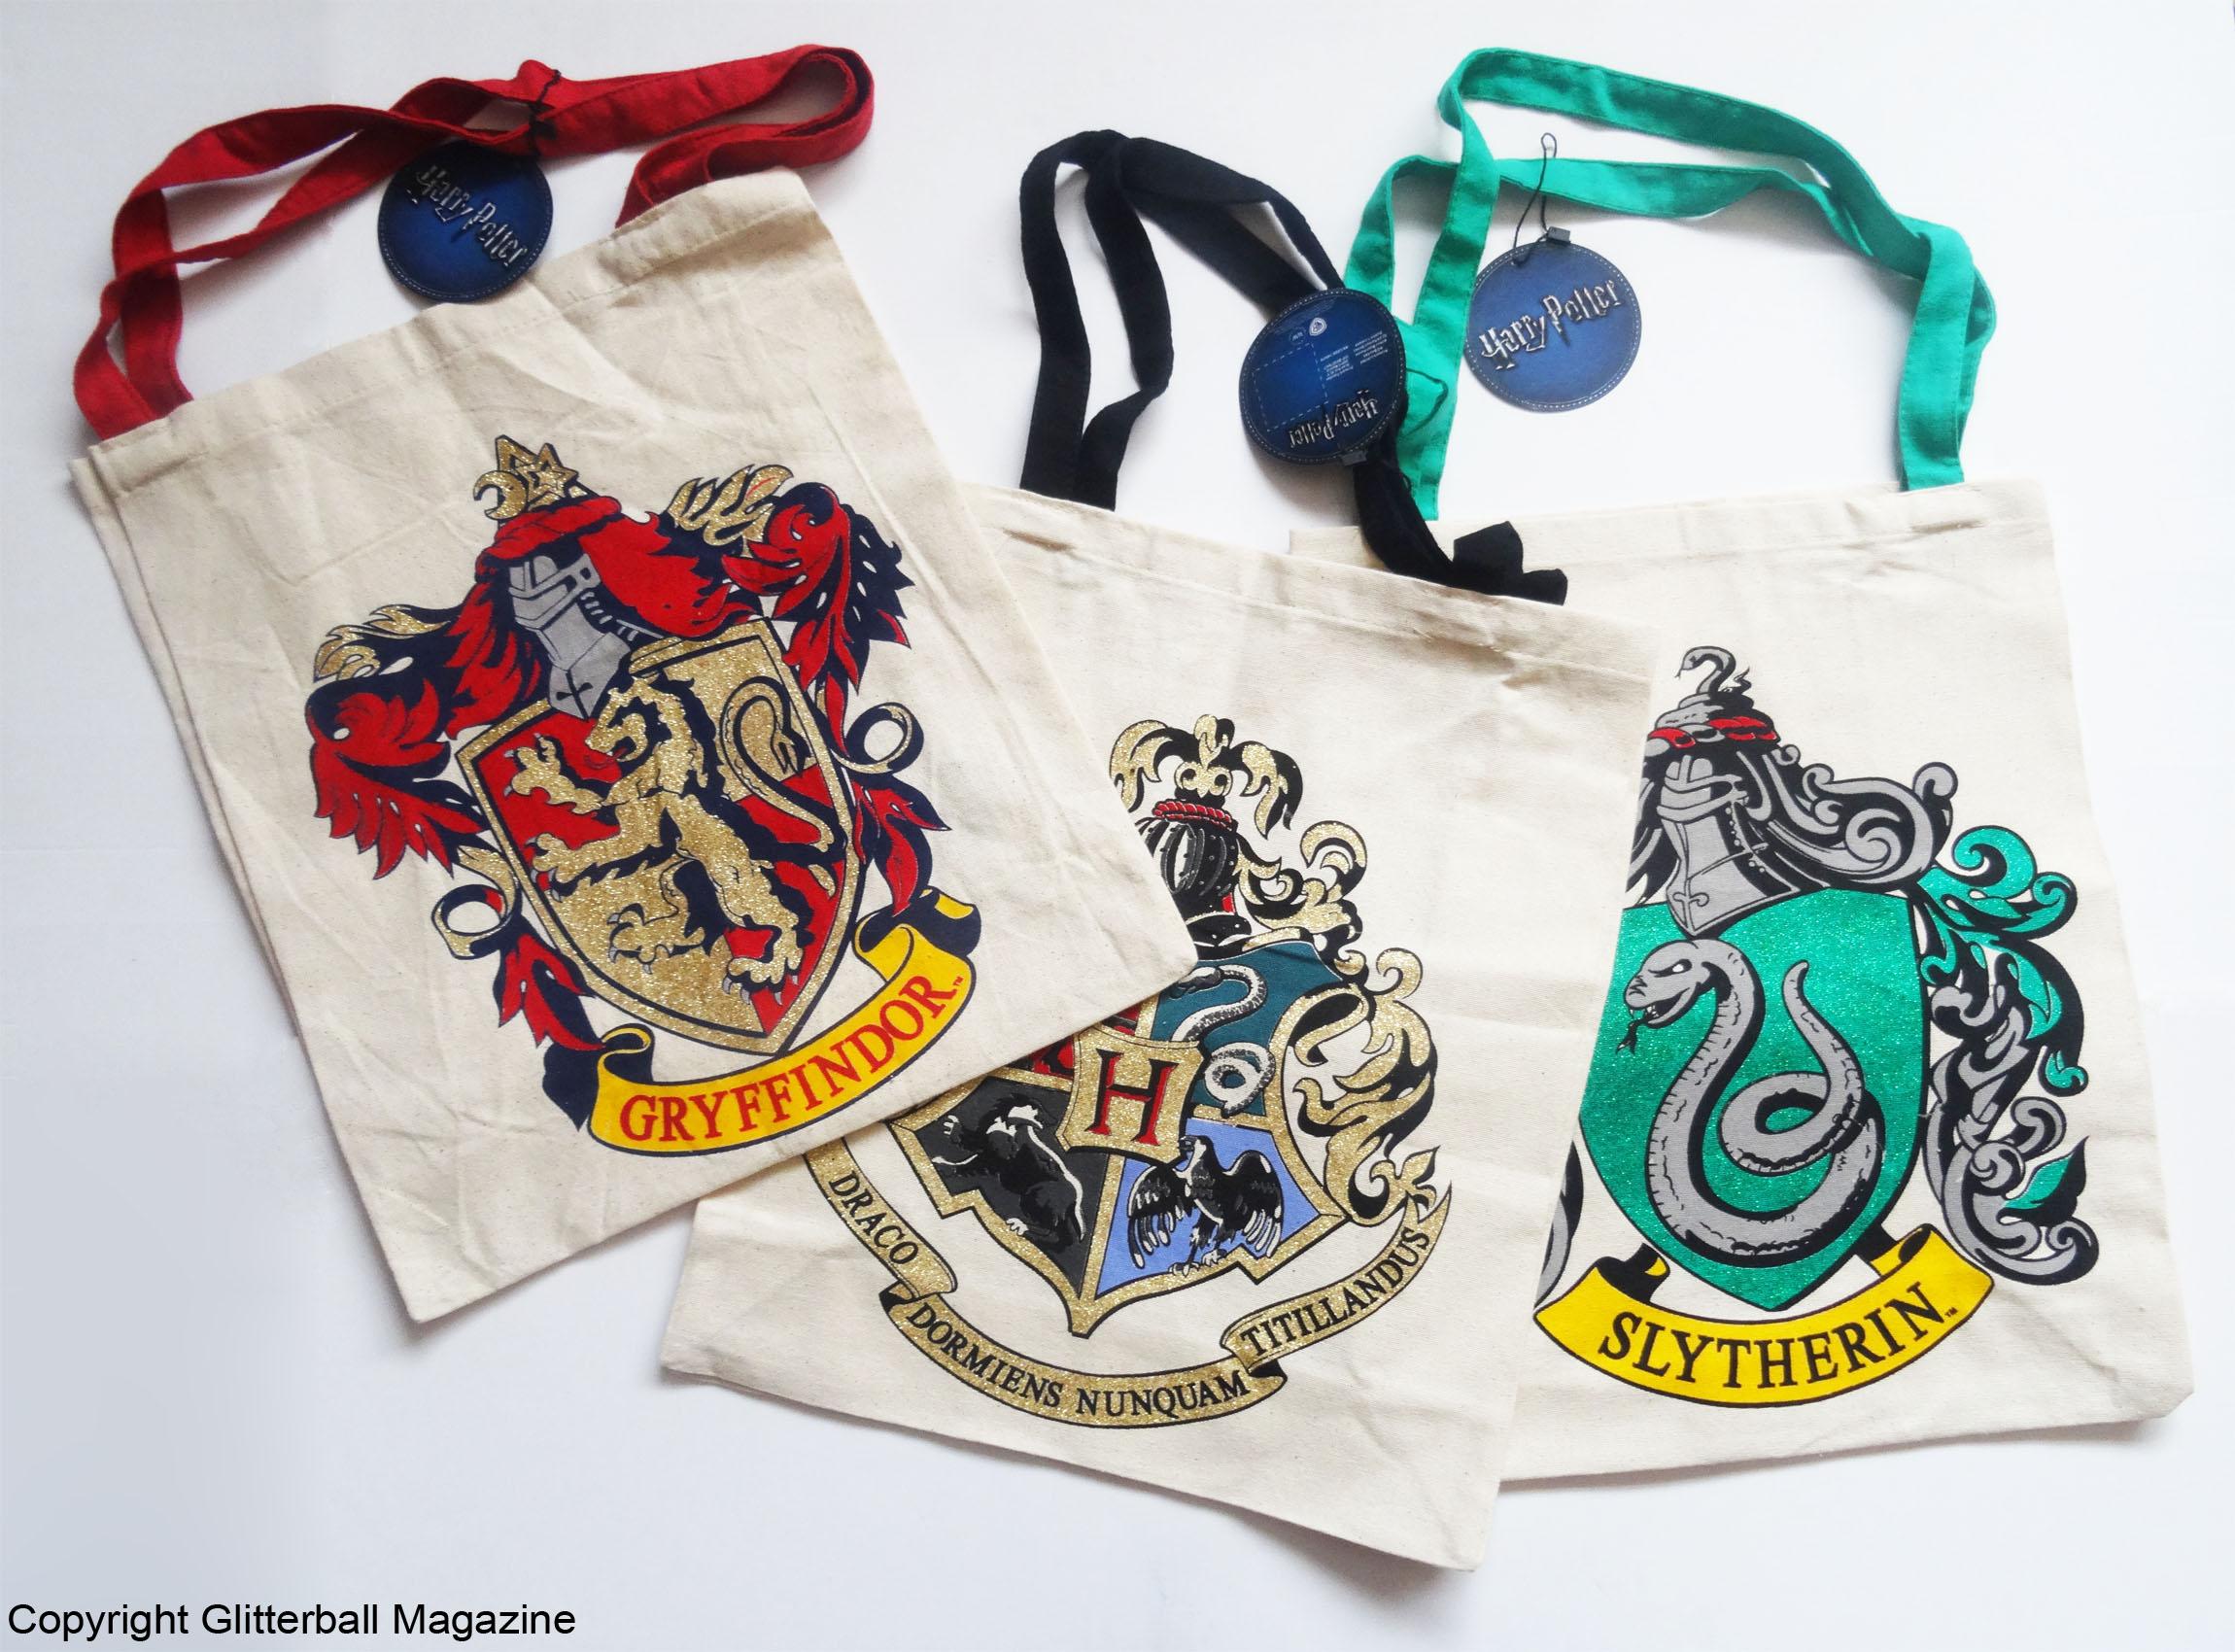 Harry Potter X Primark Haul Part 1 Glitterball Magazine